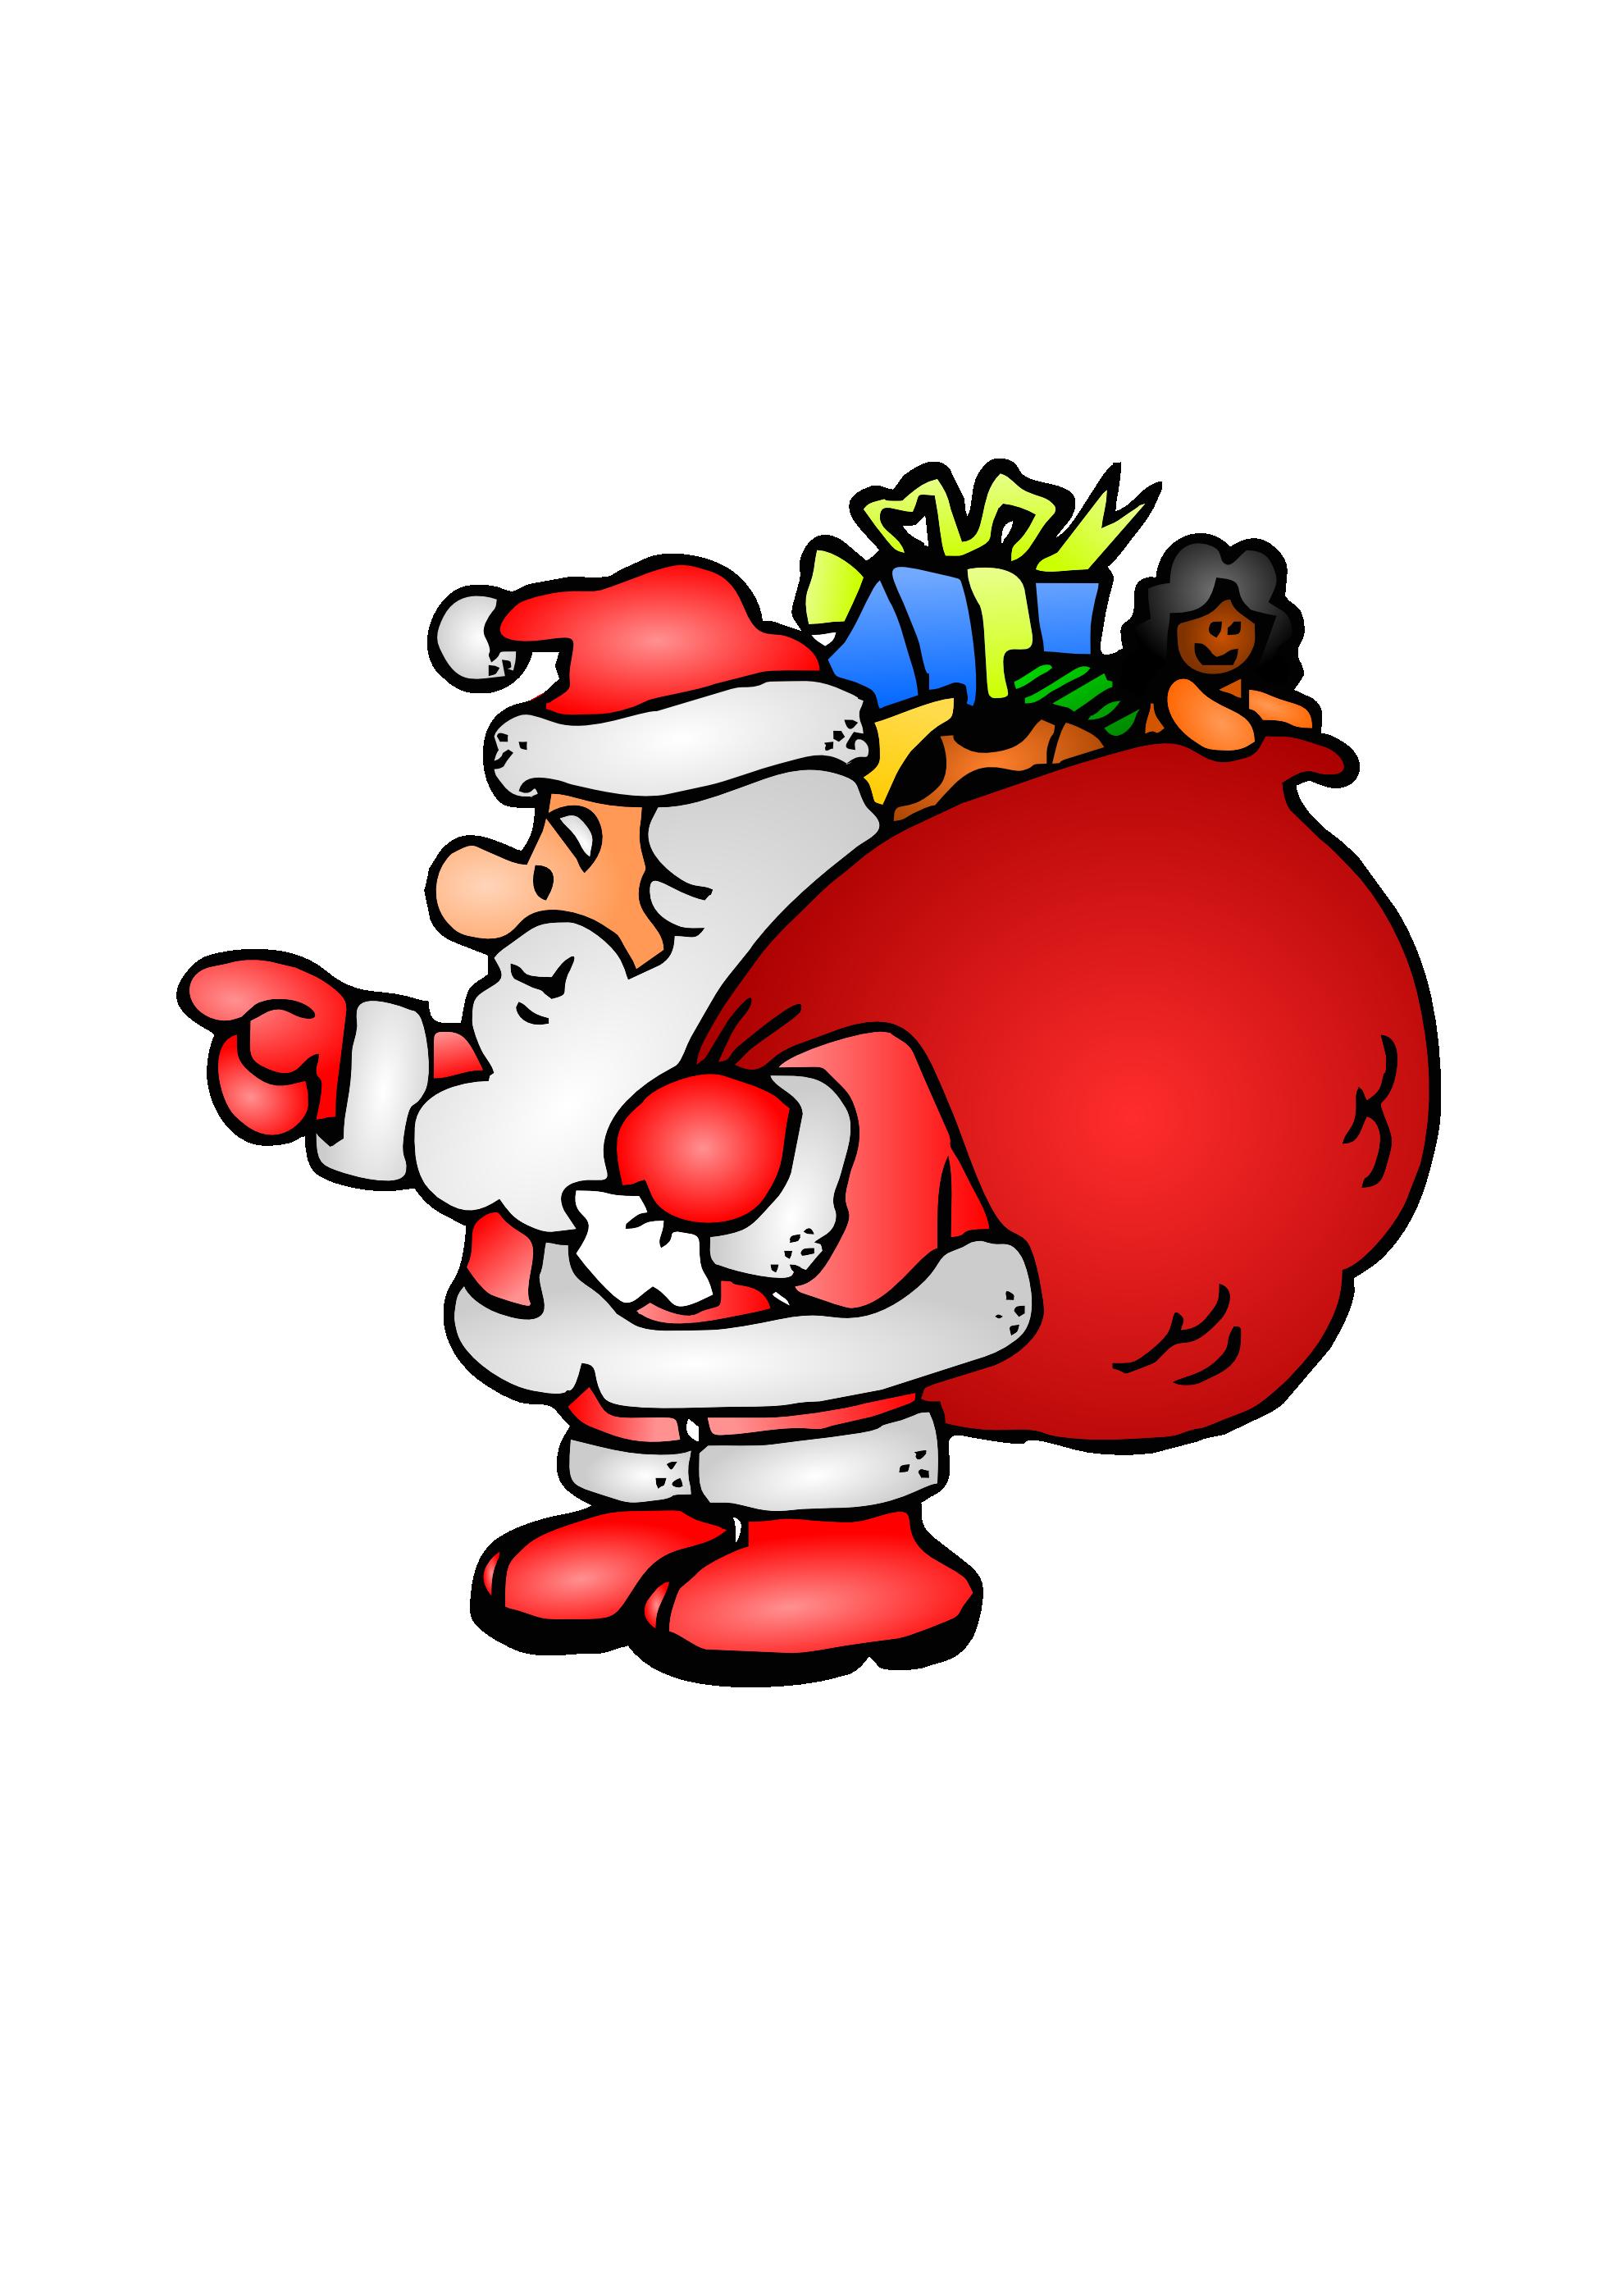 Free transparent santa christmas presents tower clipart black and white download Free Santa Bag Cliparts, Download Free Clip Art, Free Clip Art on ... black and white download